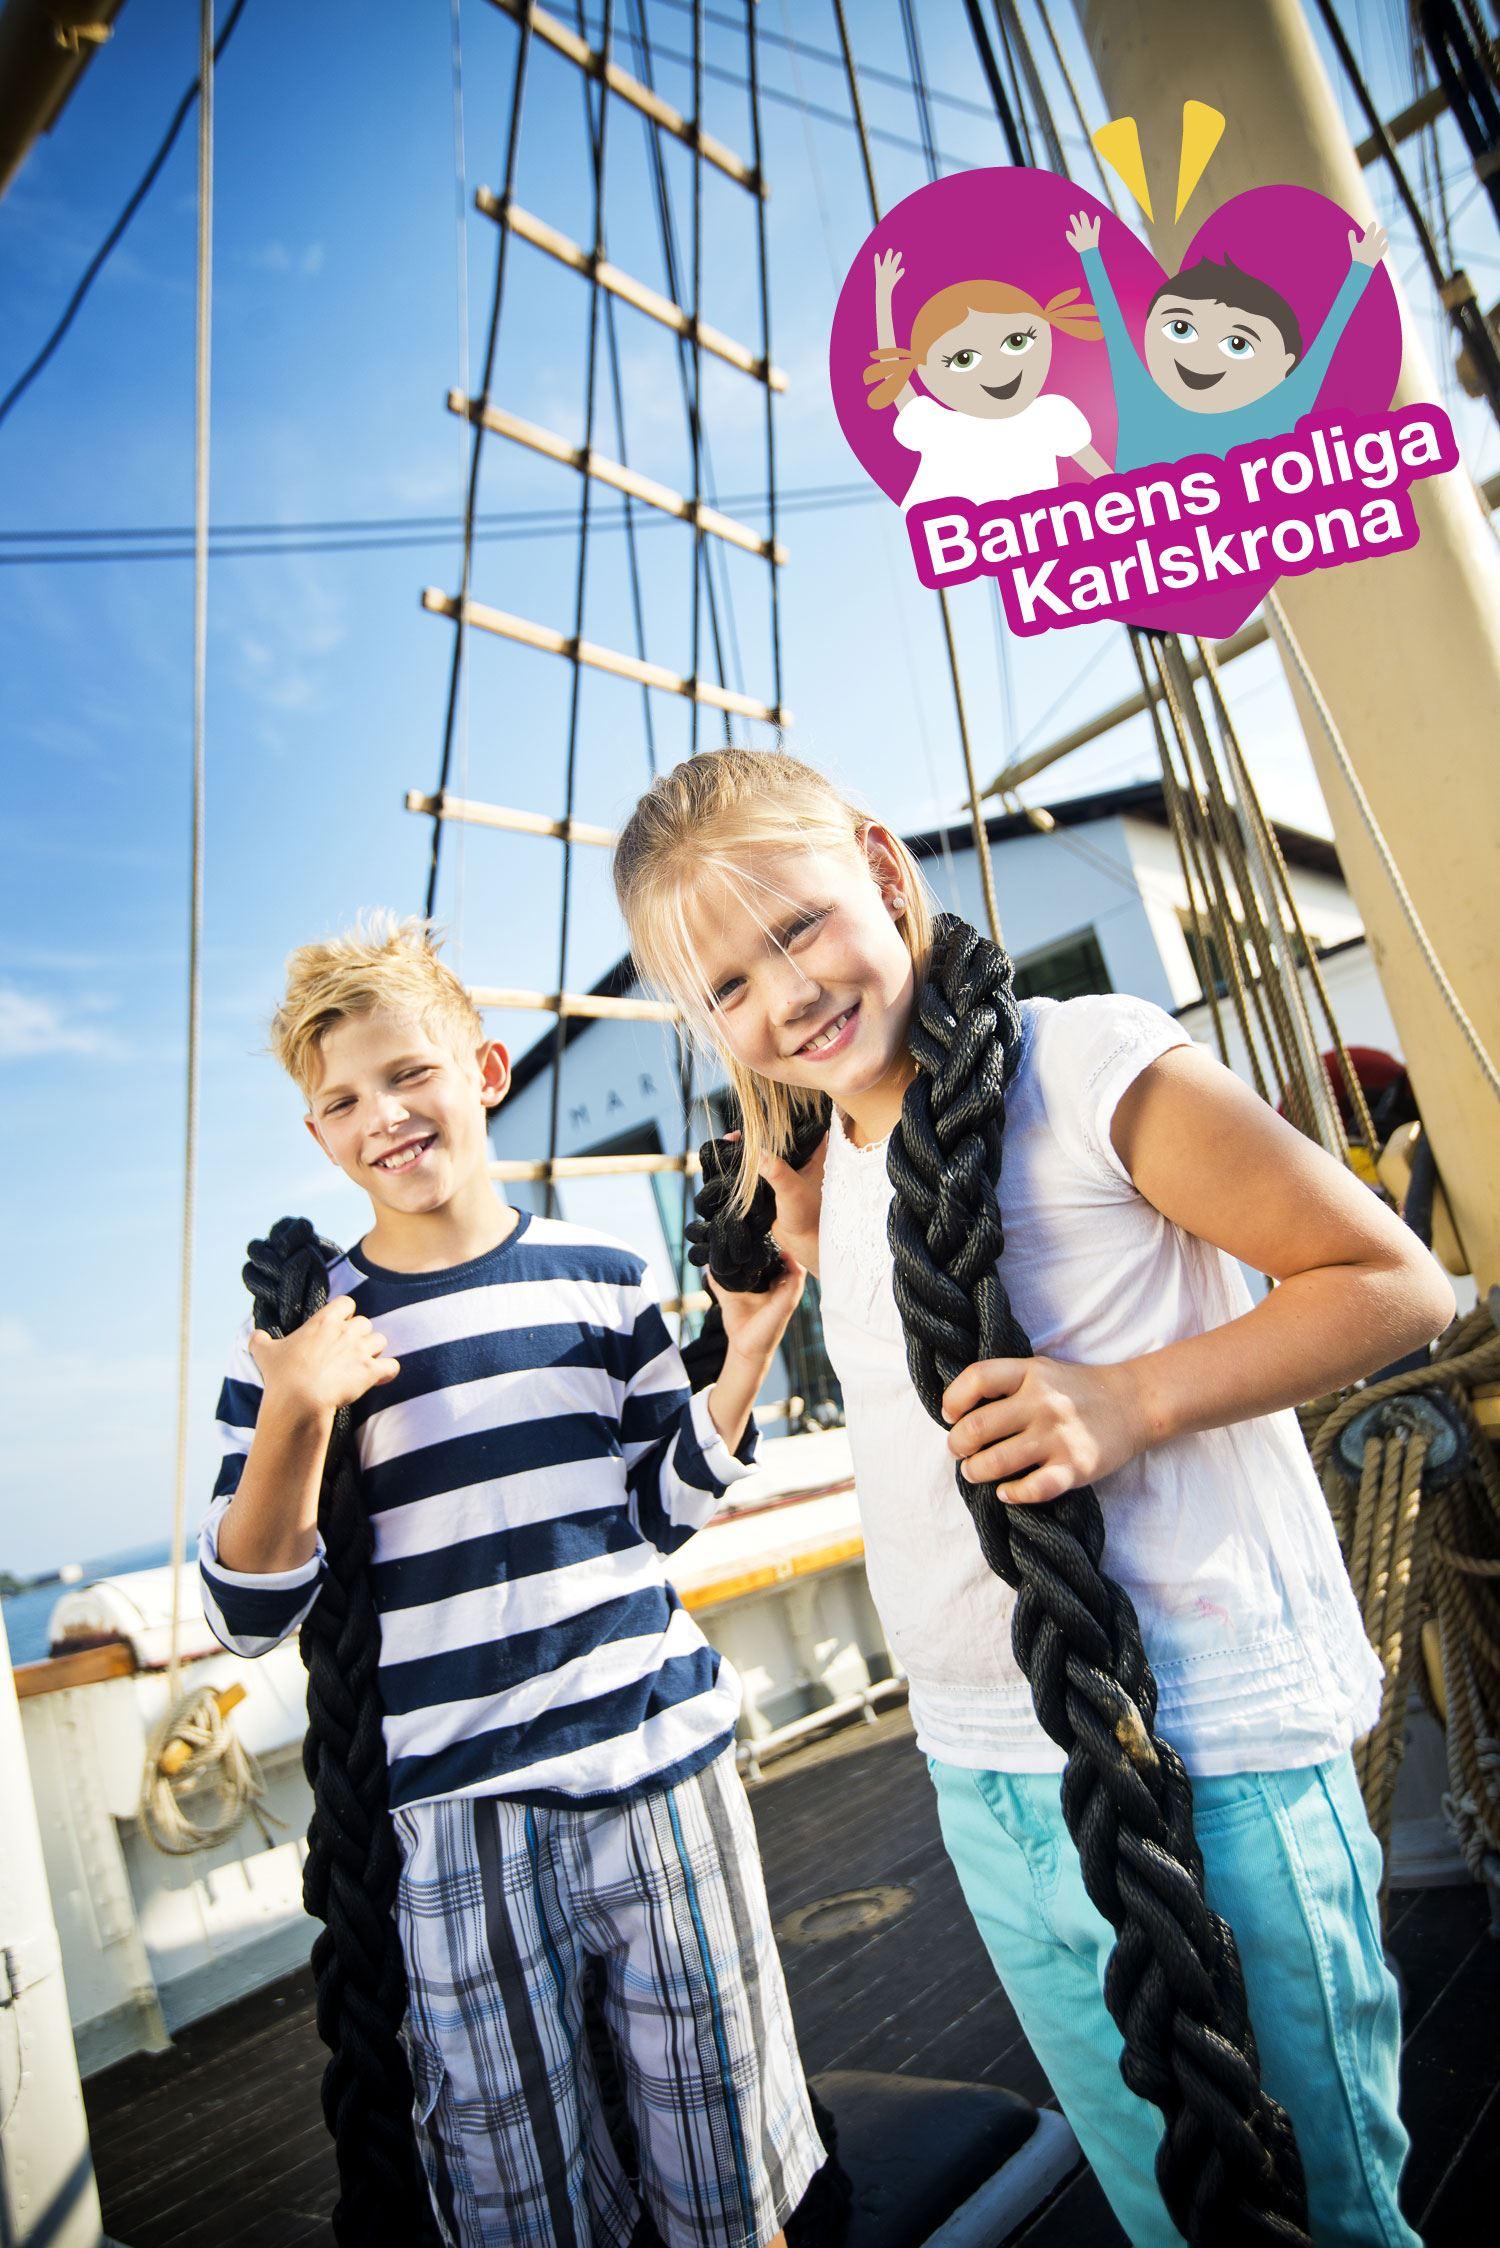 Fun for kids Karlskrona – Advantage card